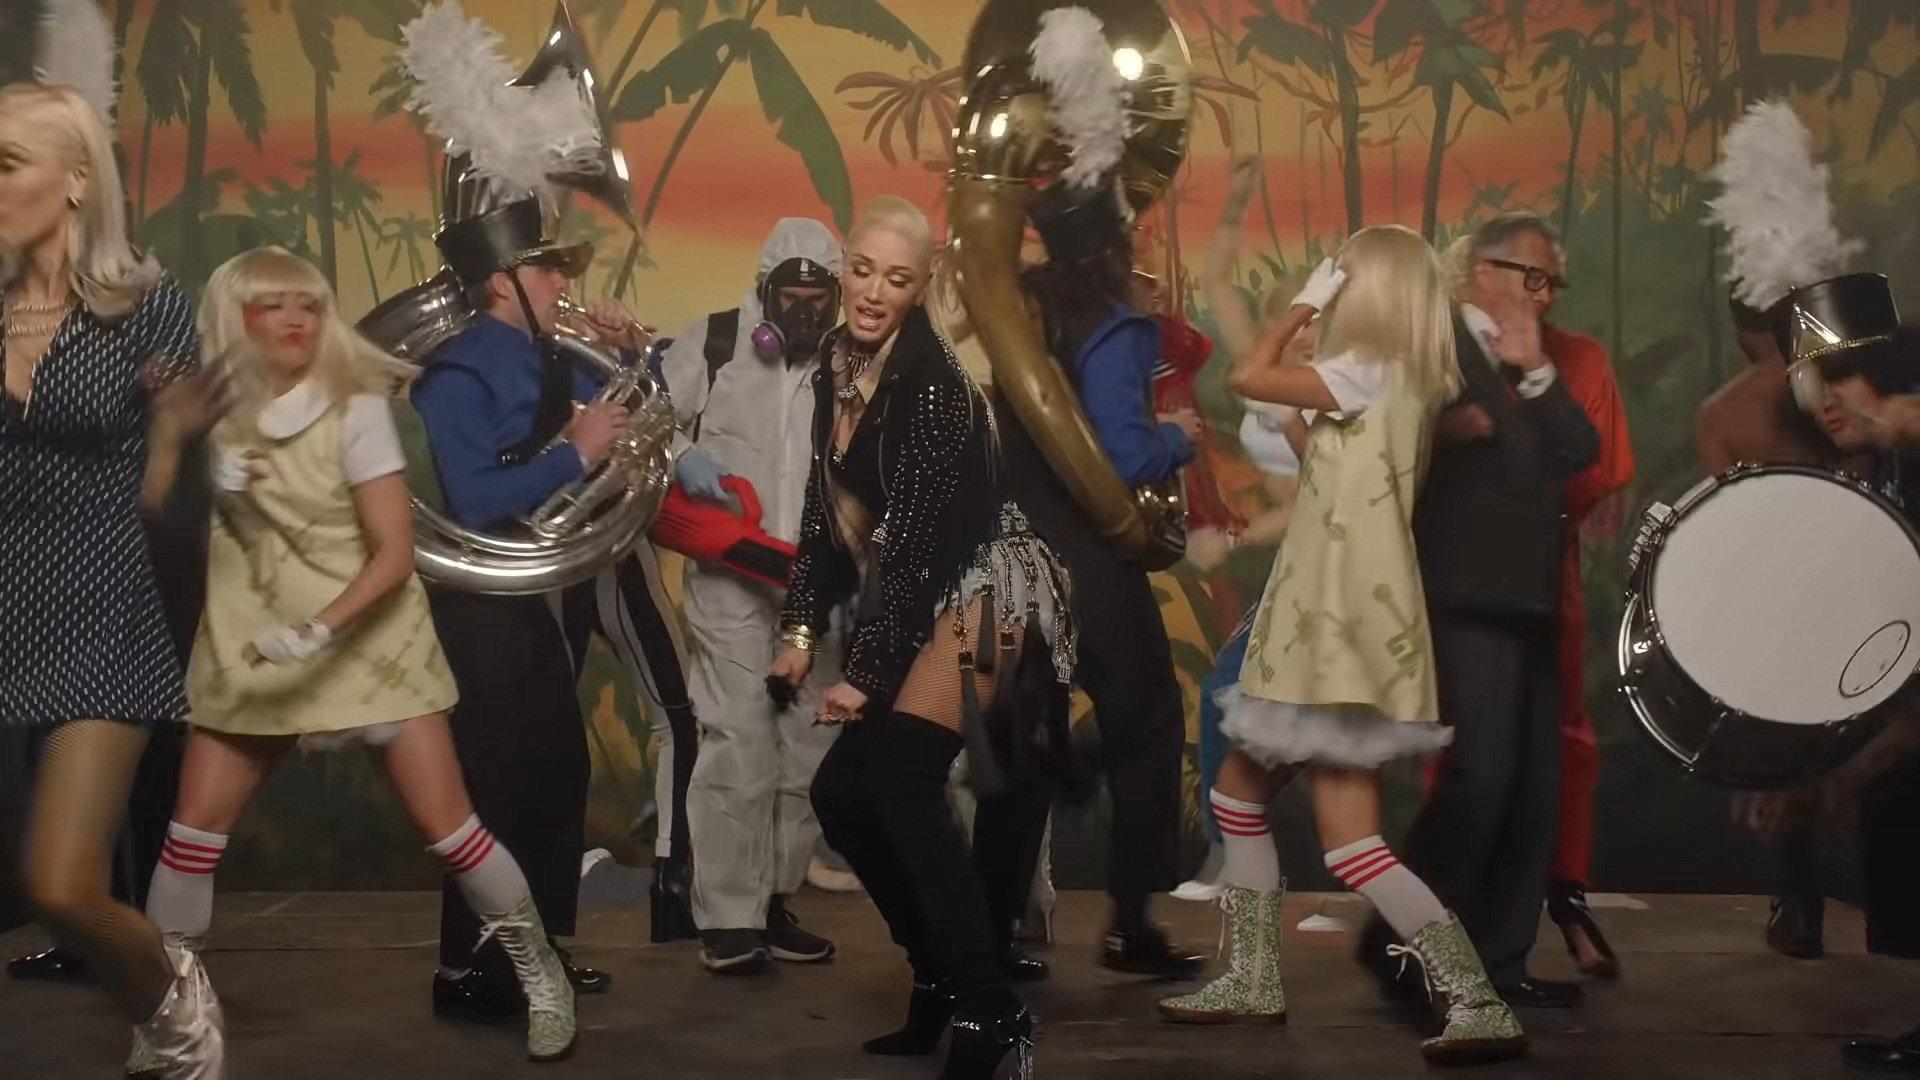 Gwen Stefani - Let Me Reintroduce Myself (Official Video) 3-20 Screenshot